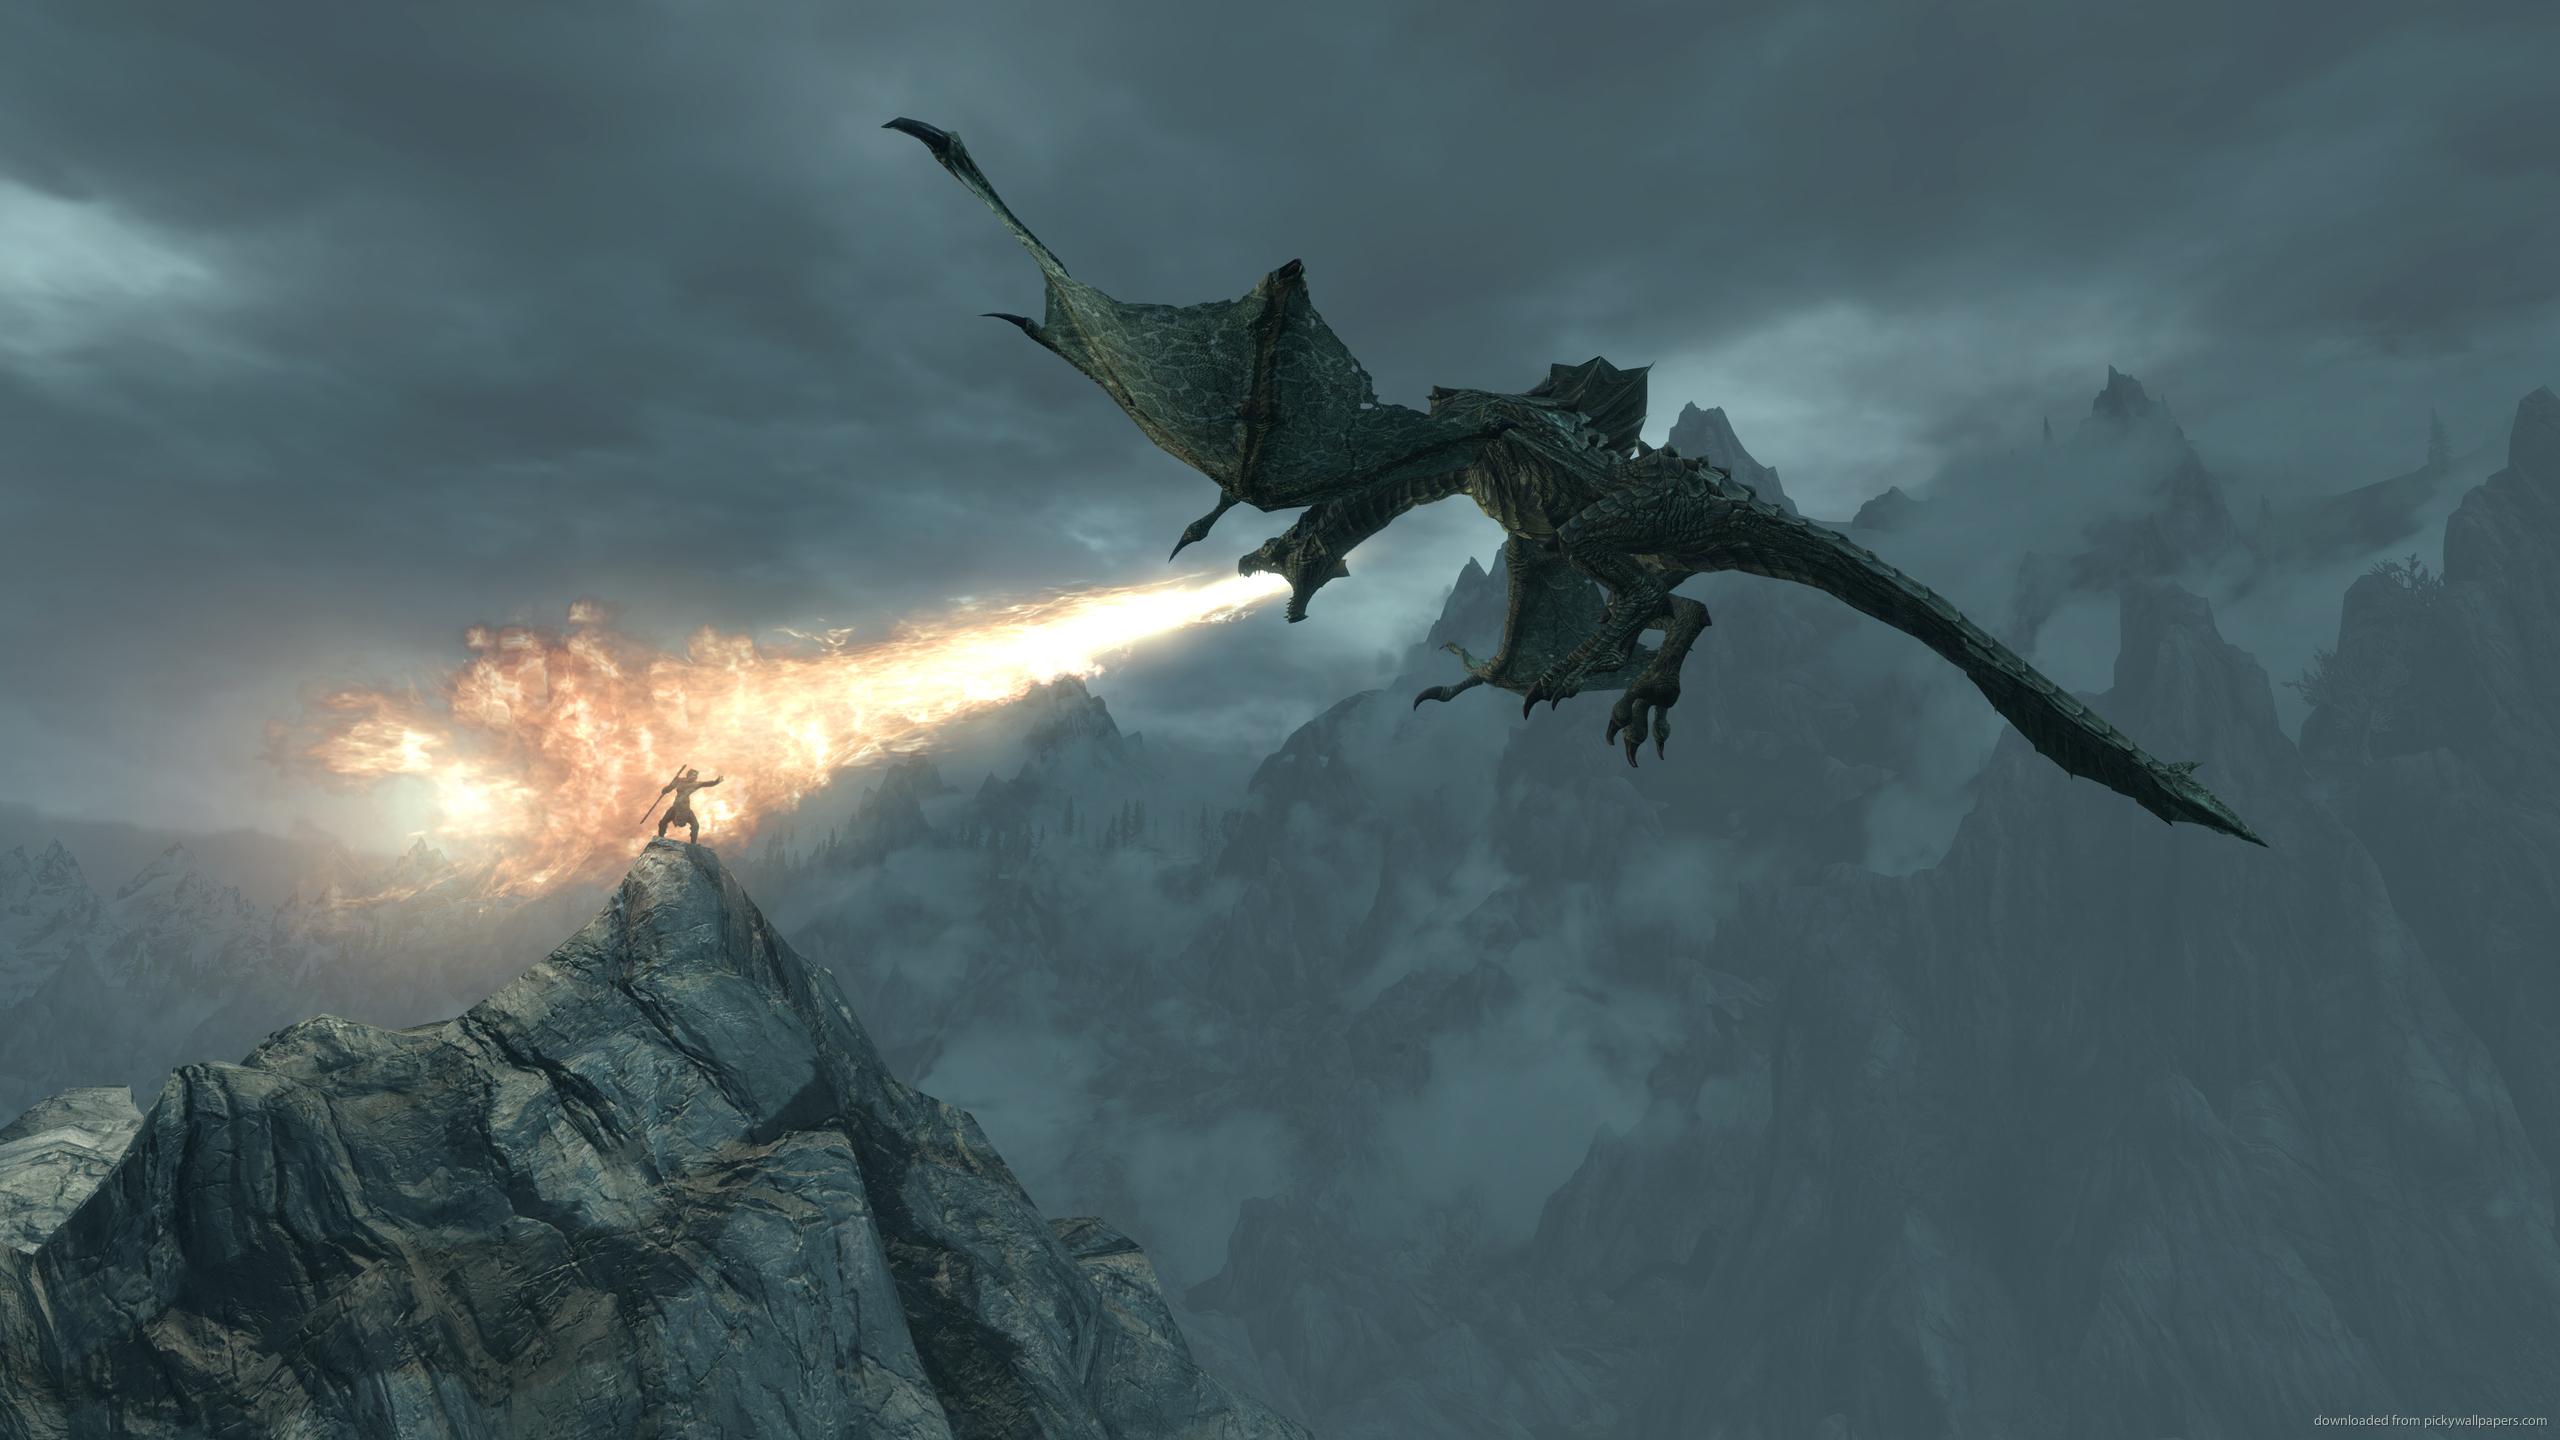 Skyrim Epic Dragon Breath wallpaper 2560x1440